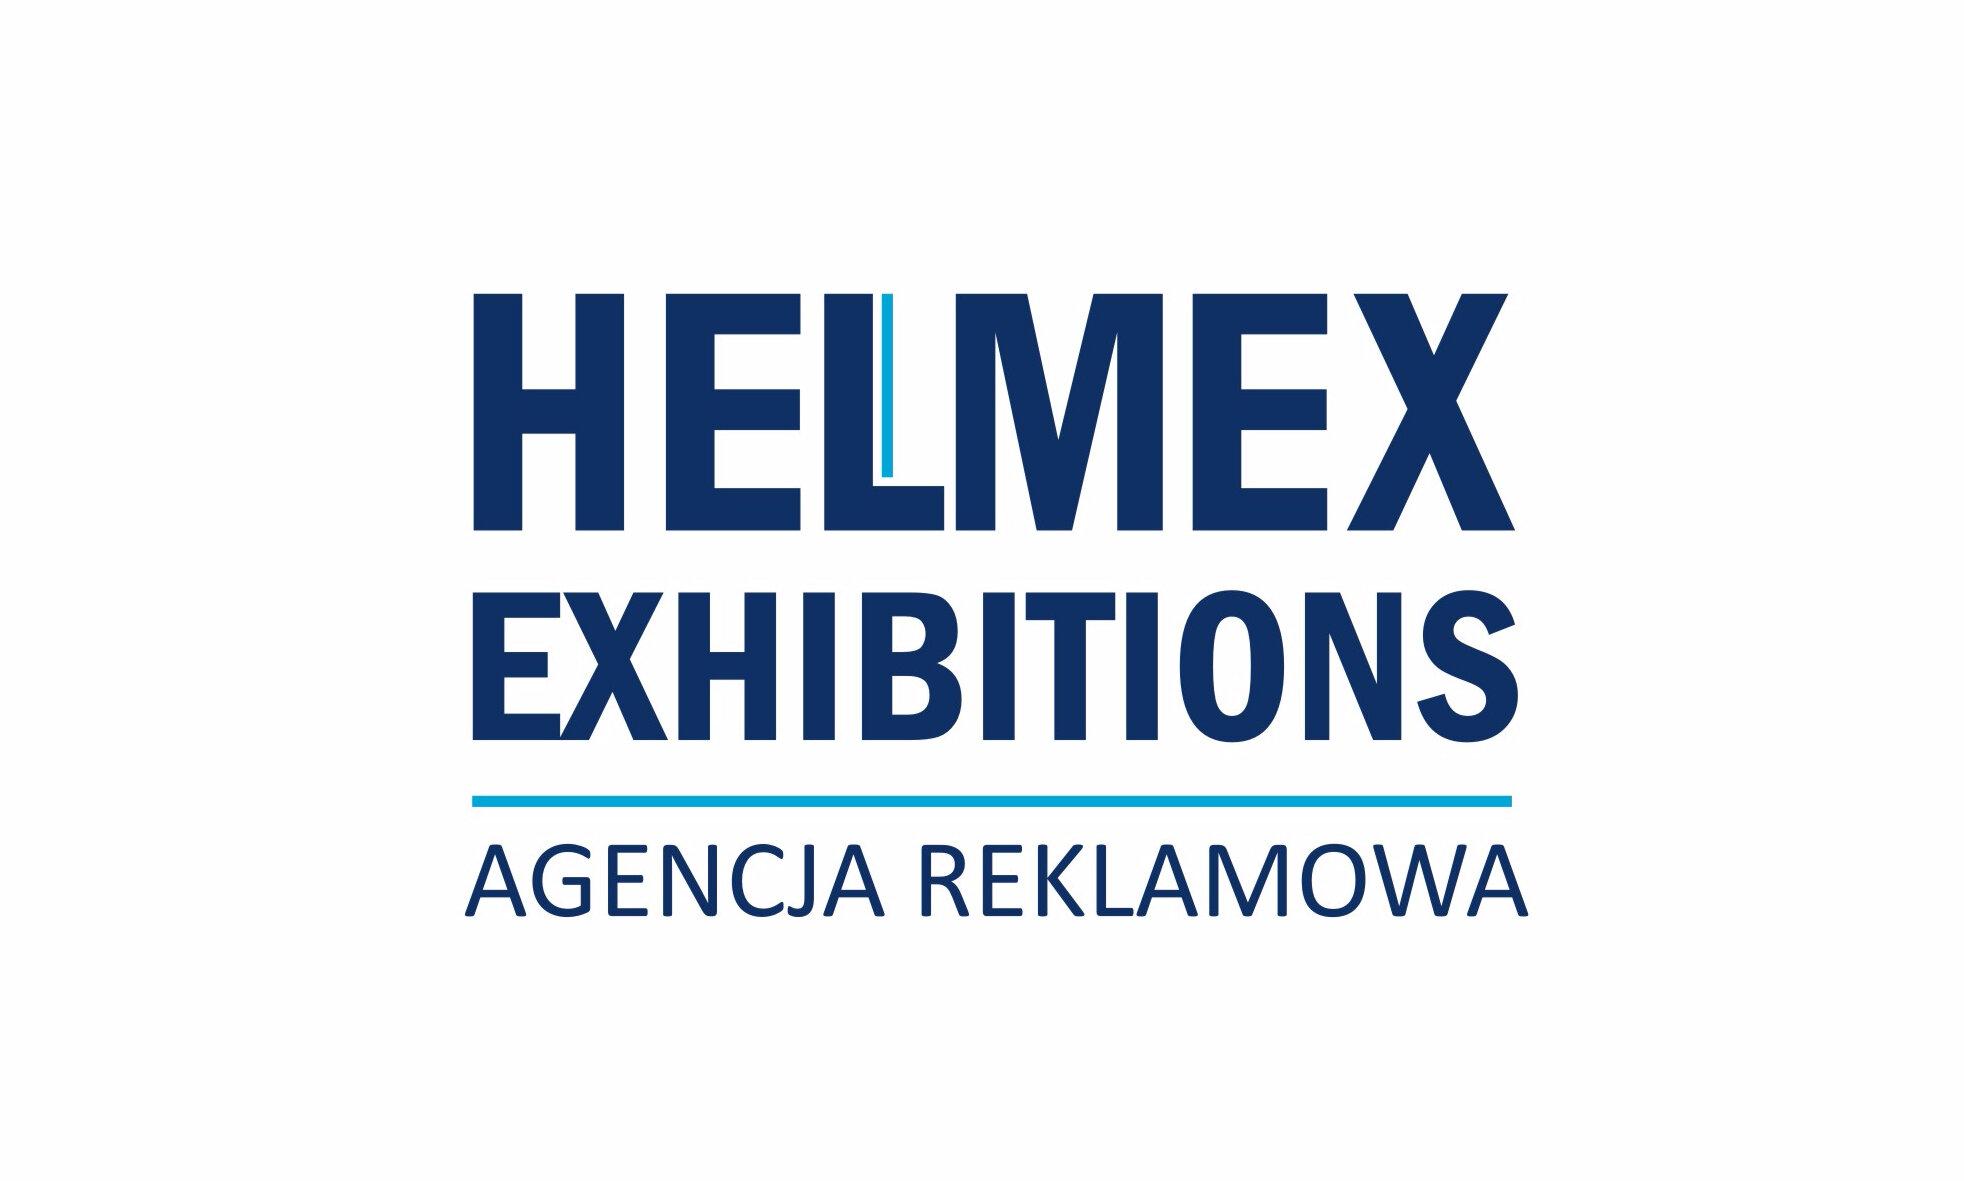 helmex_3.jpg